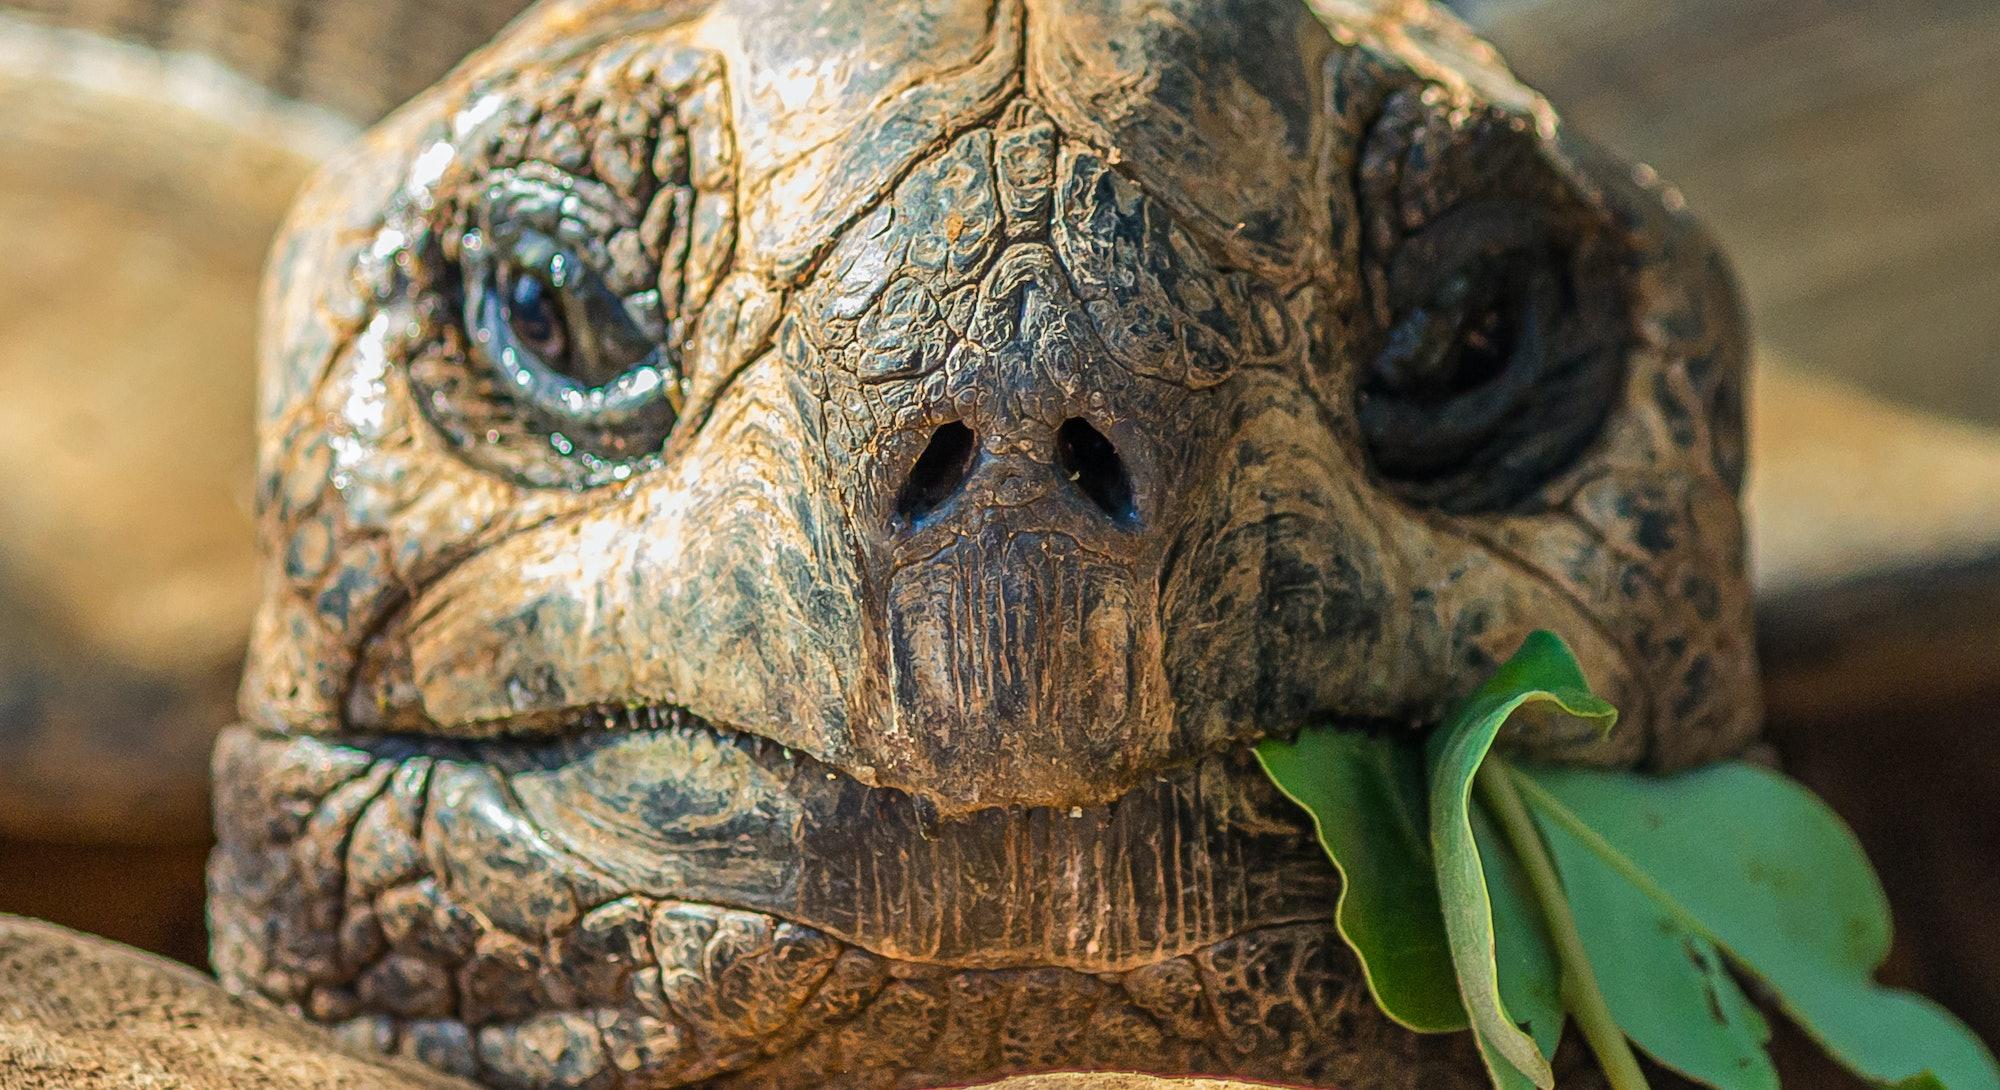 Portrait of a large elephant tortoise (Chelonoidis elephantopus) eats a branch with leaves. It is al...